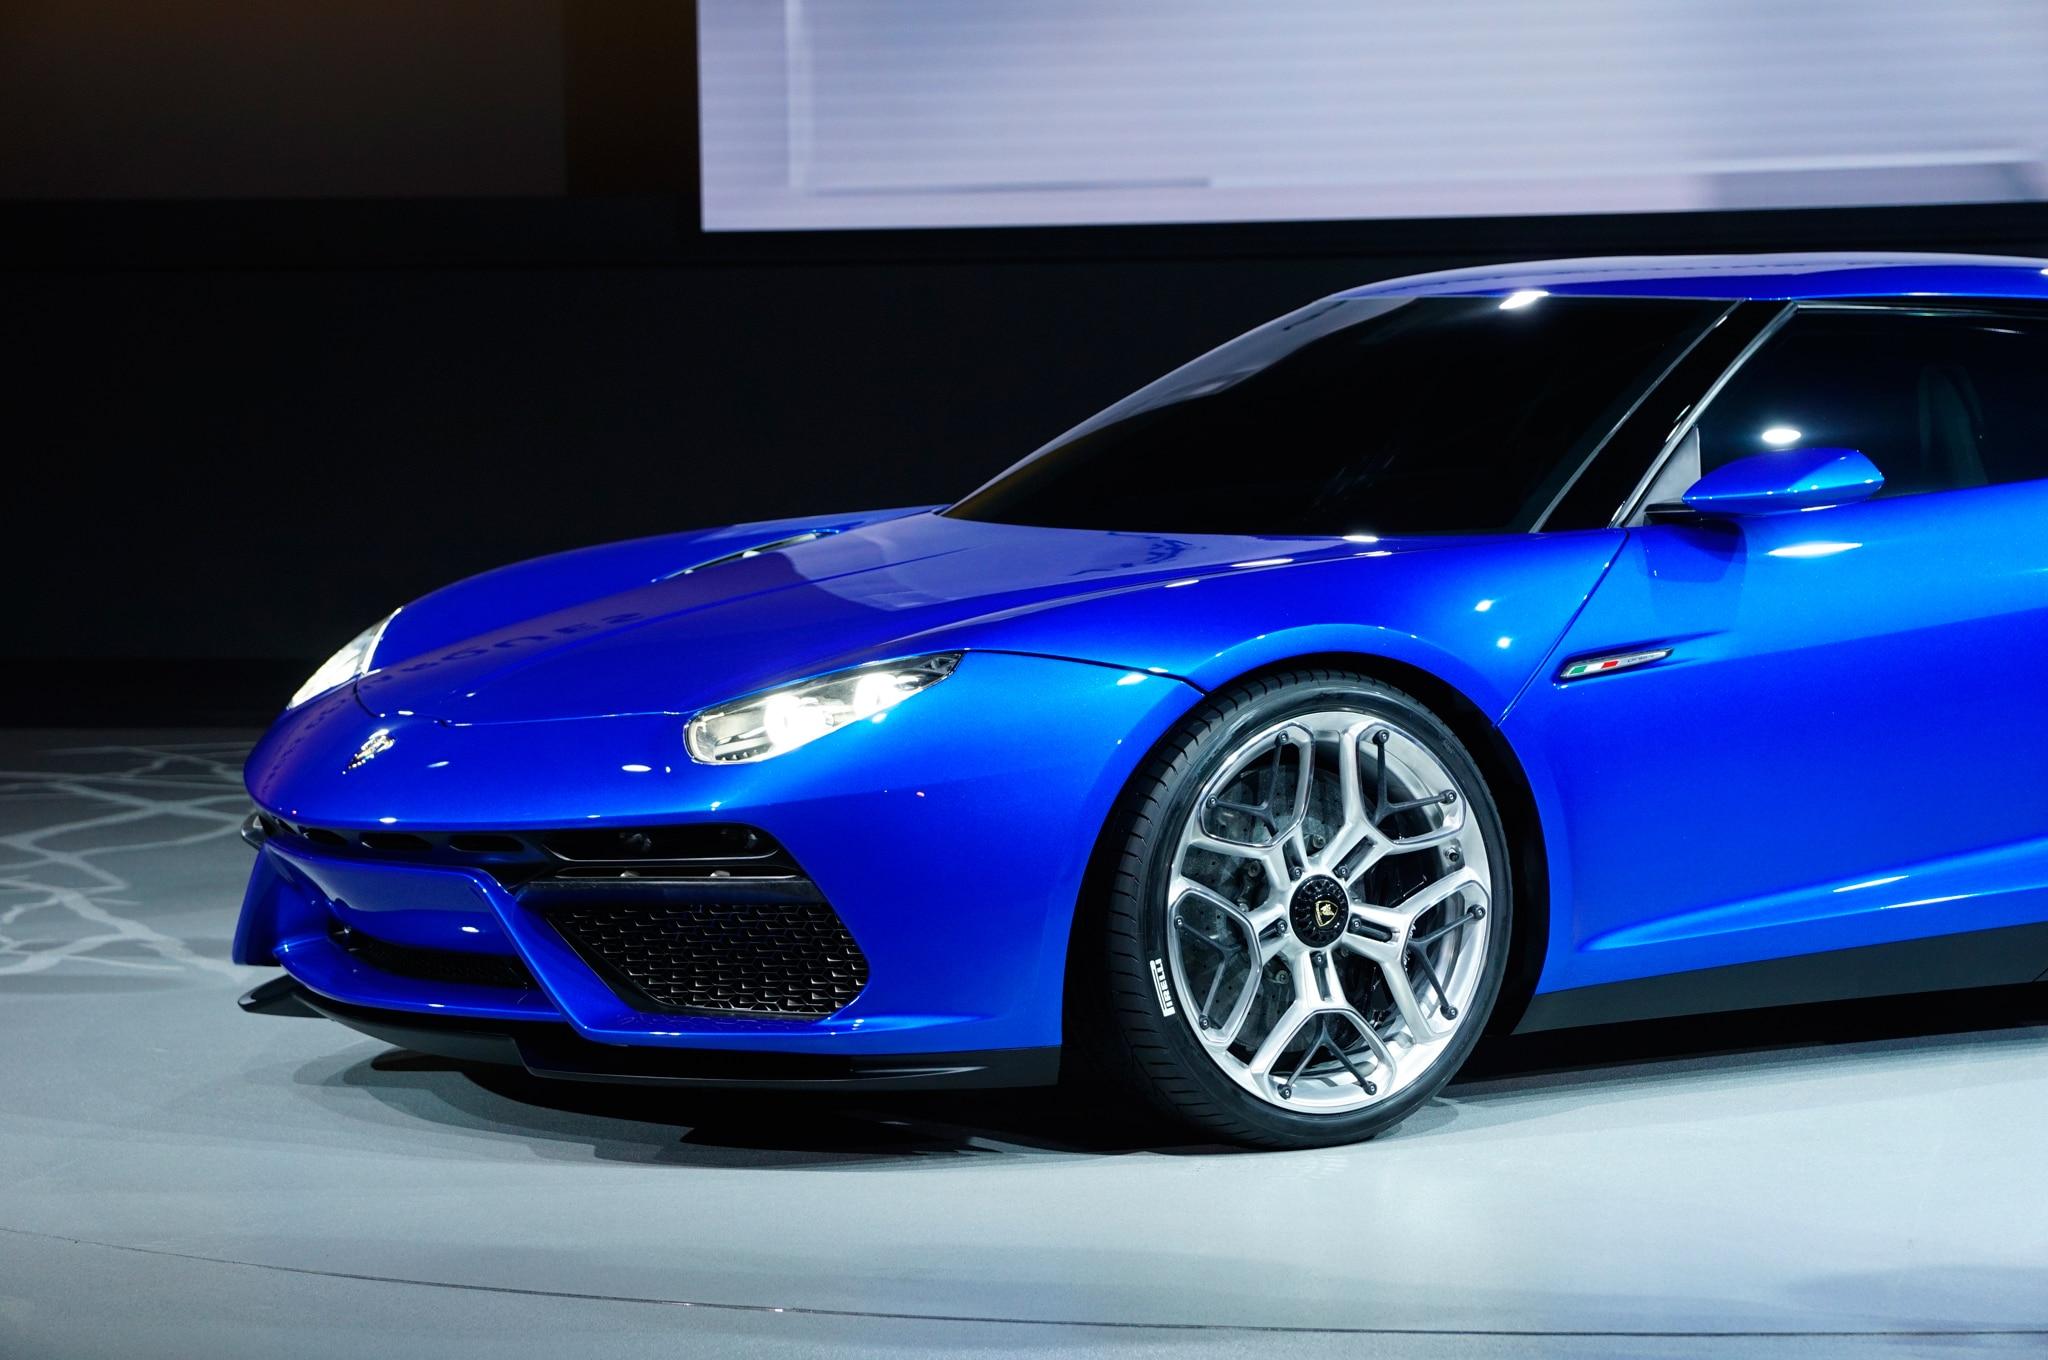 Lamborghini Asterion Concept Hybrid Brings 900 HP To Paris